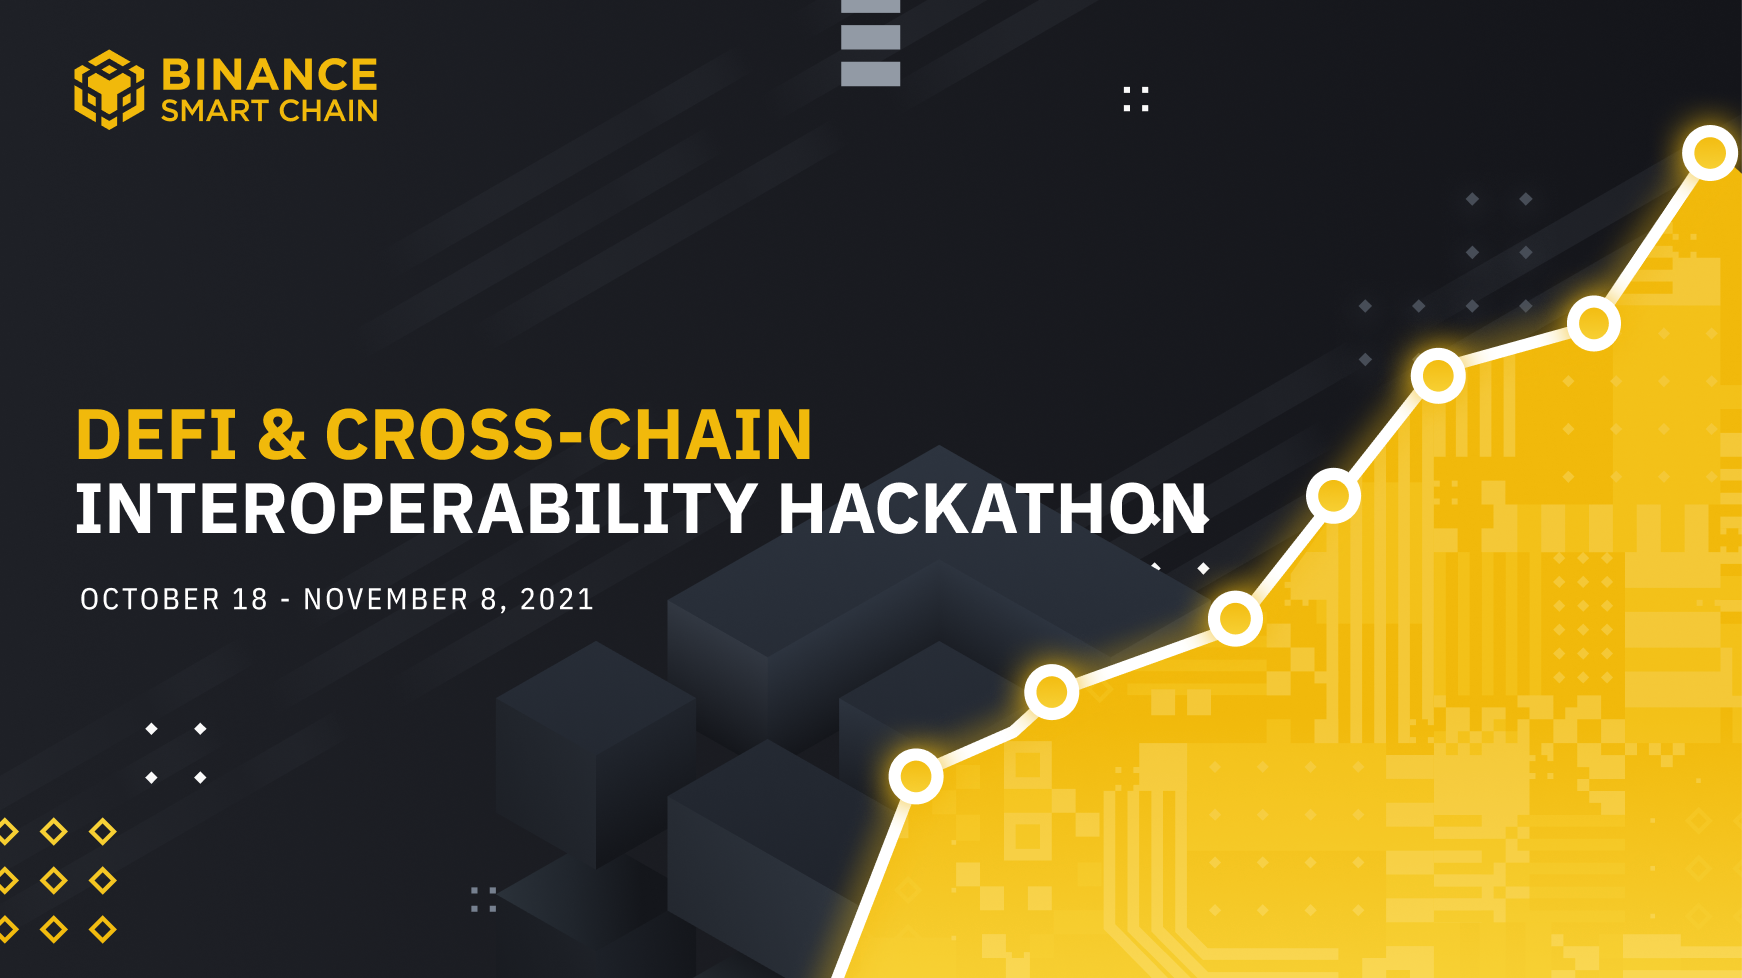 BSC Joins Gitcoin DeFi & Cross-chain Hackathon